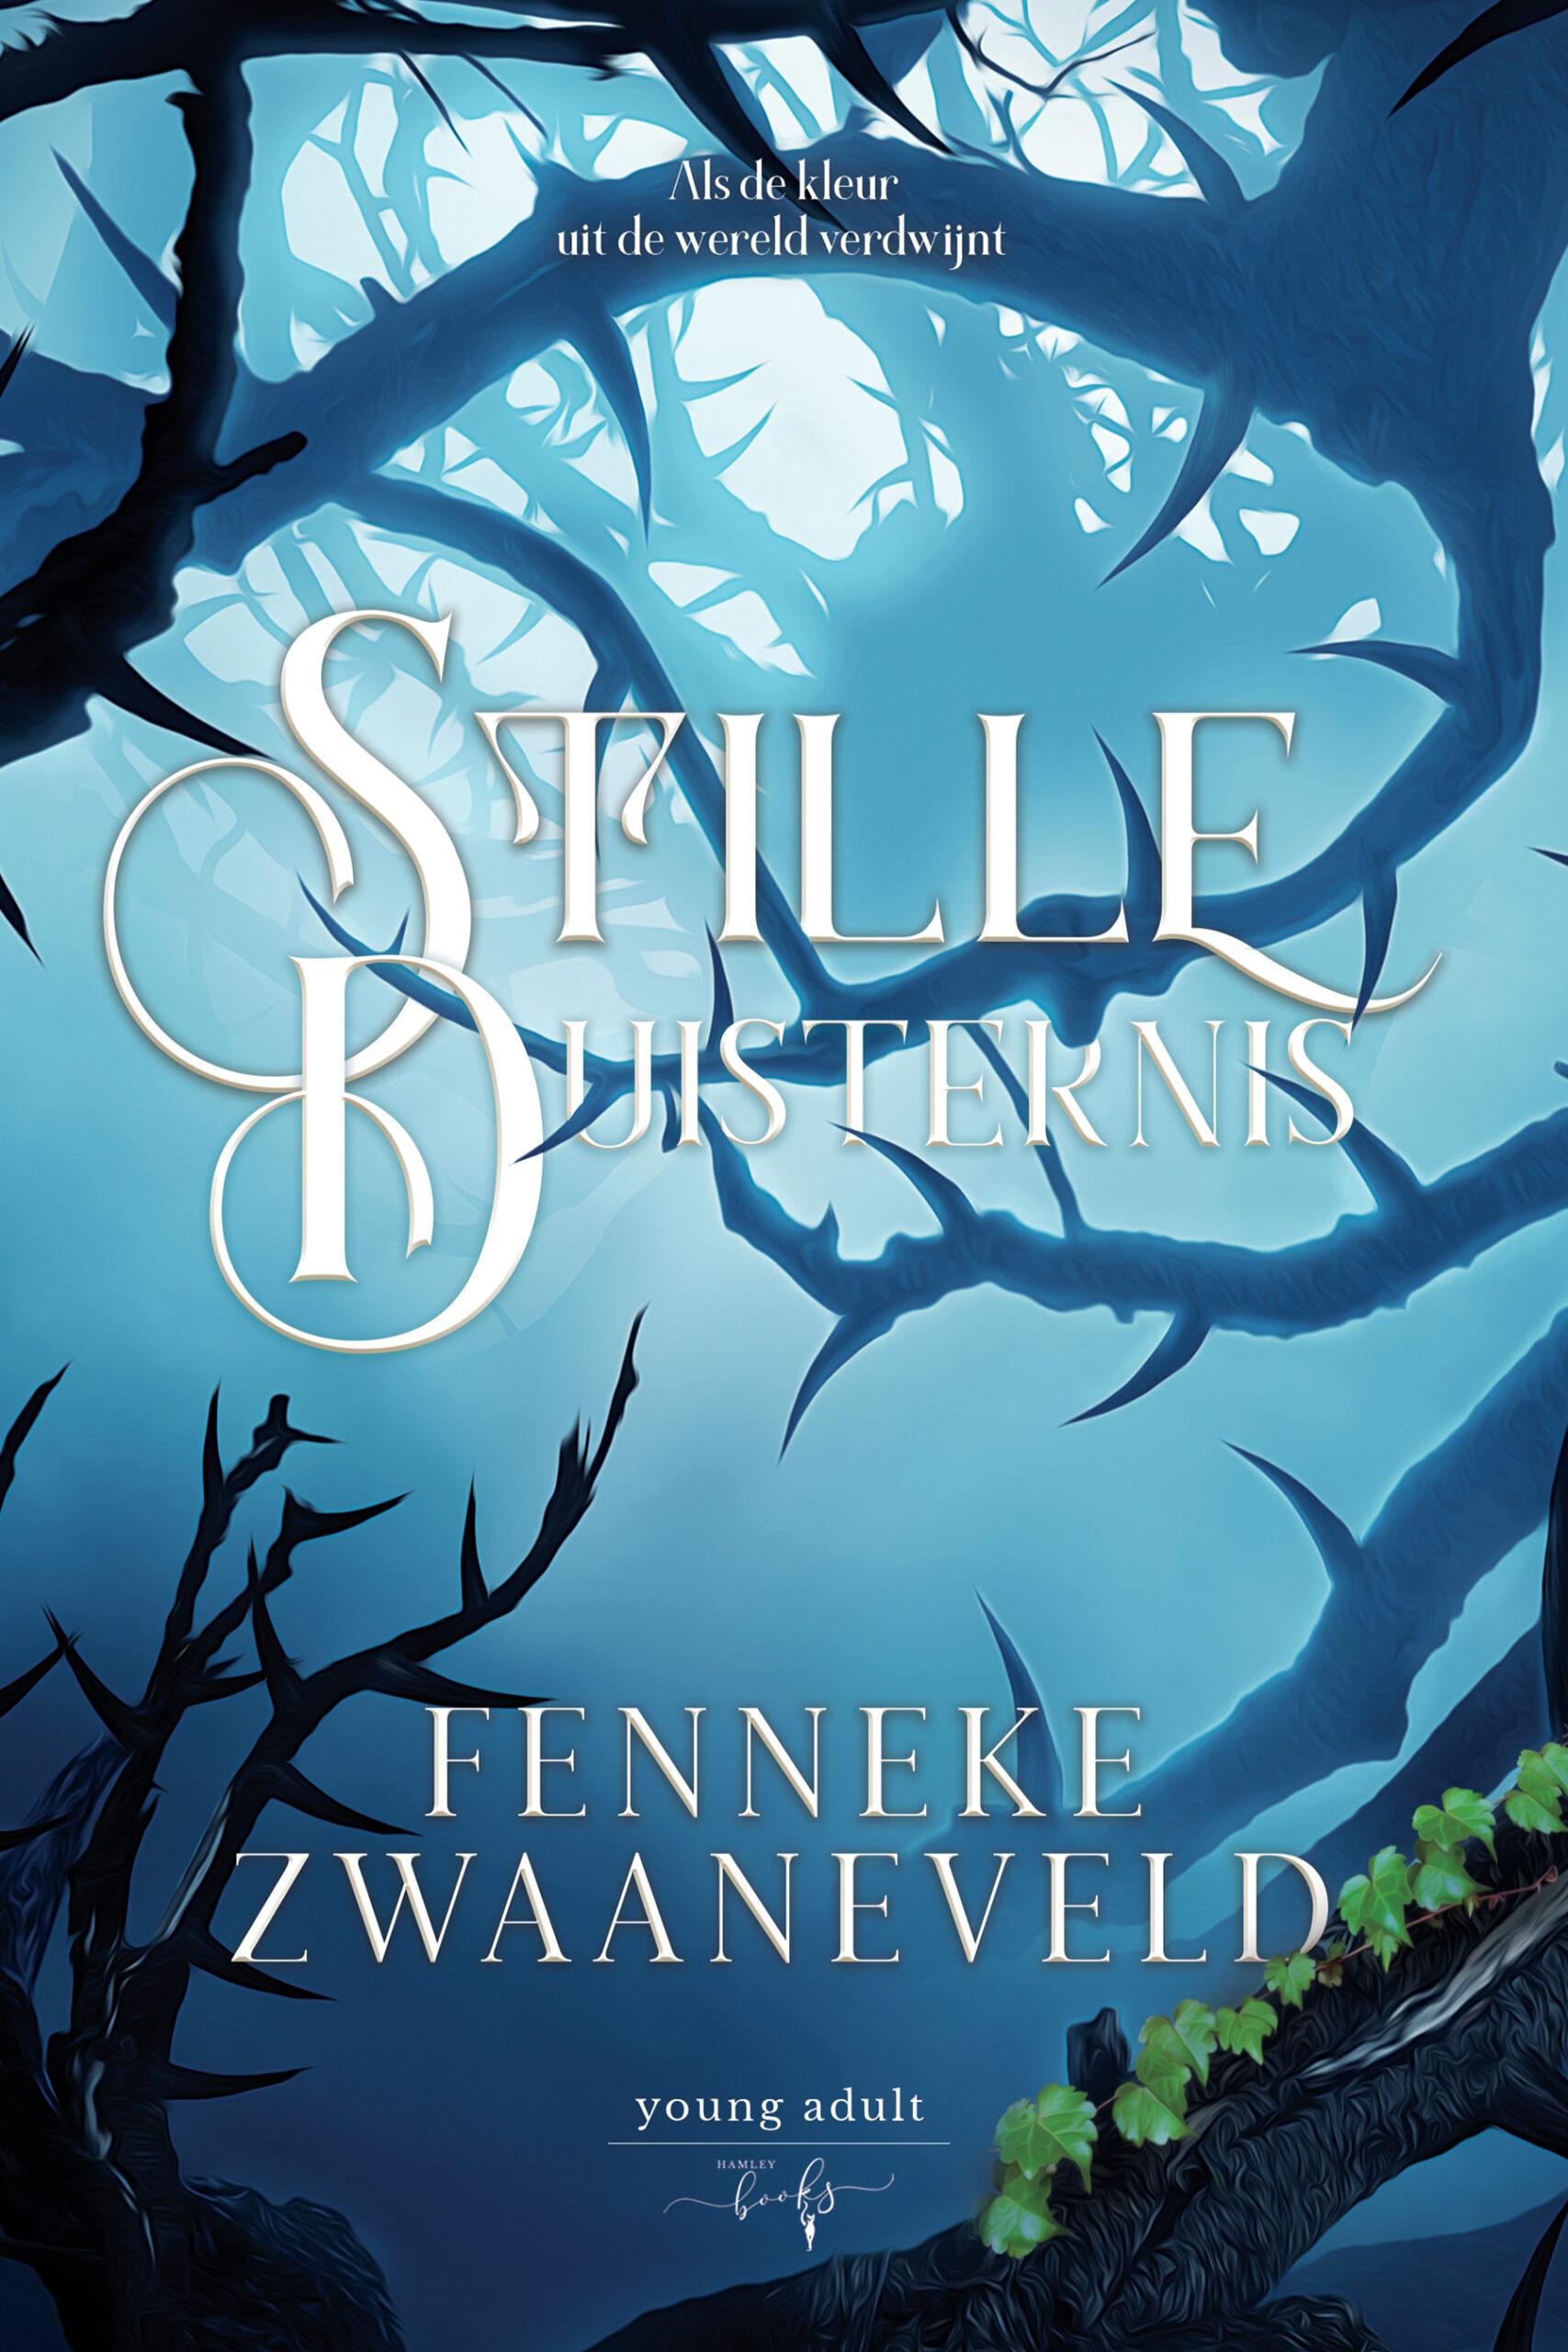 Stille duisternis - Fenneke zwaaneveld